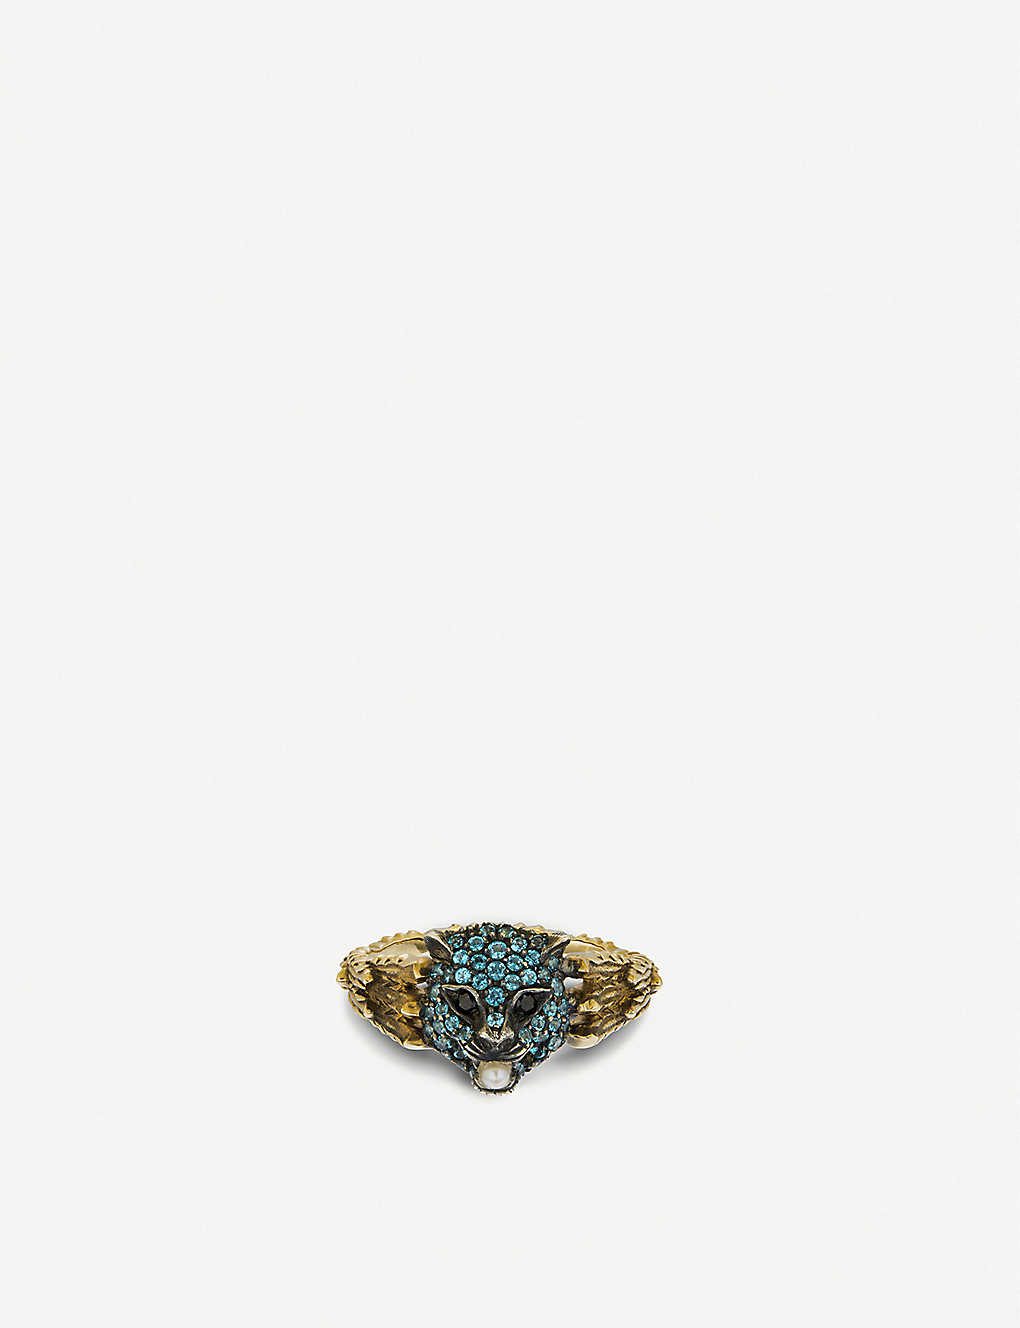 e838d5f8b GUCCI - Le Marché des Merveilles ring 18ct yellow-gold ring ...